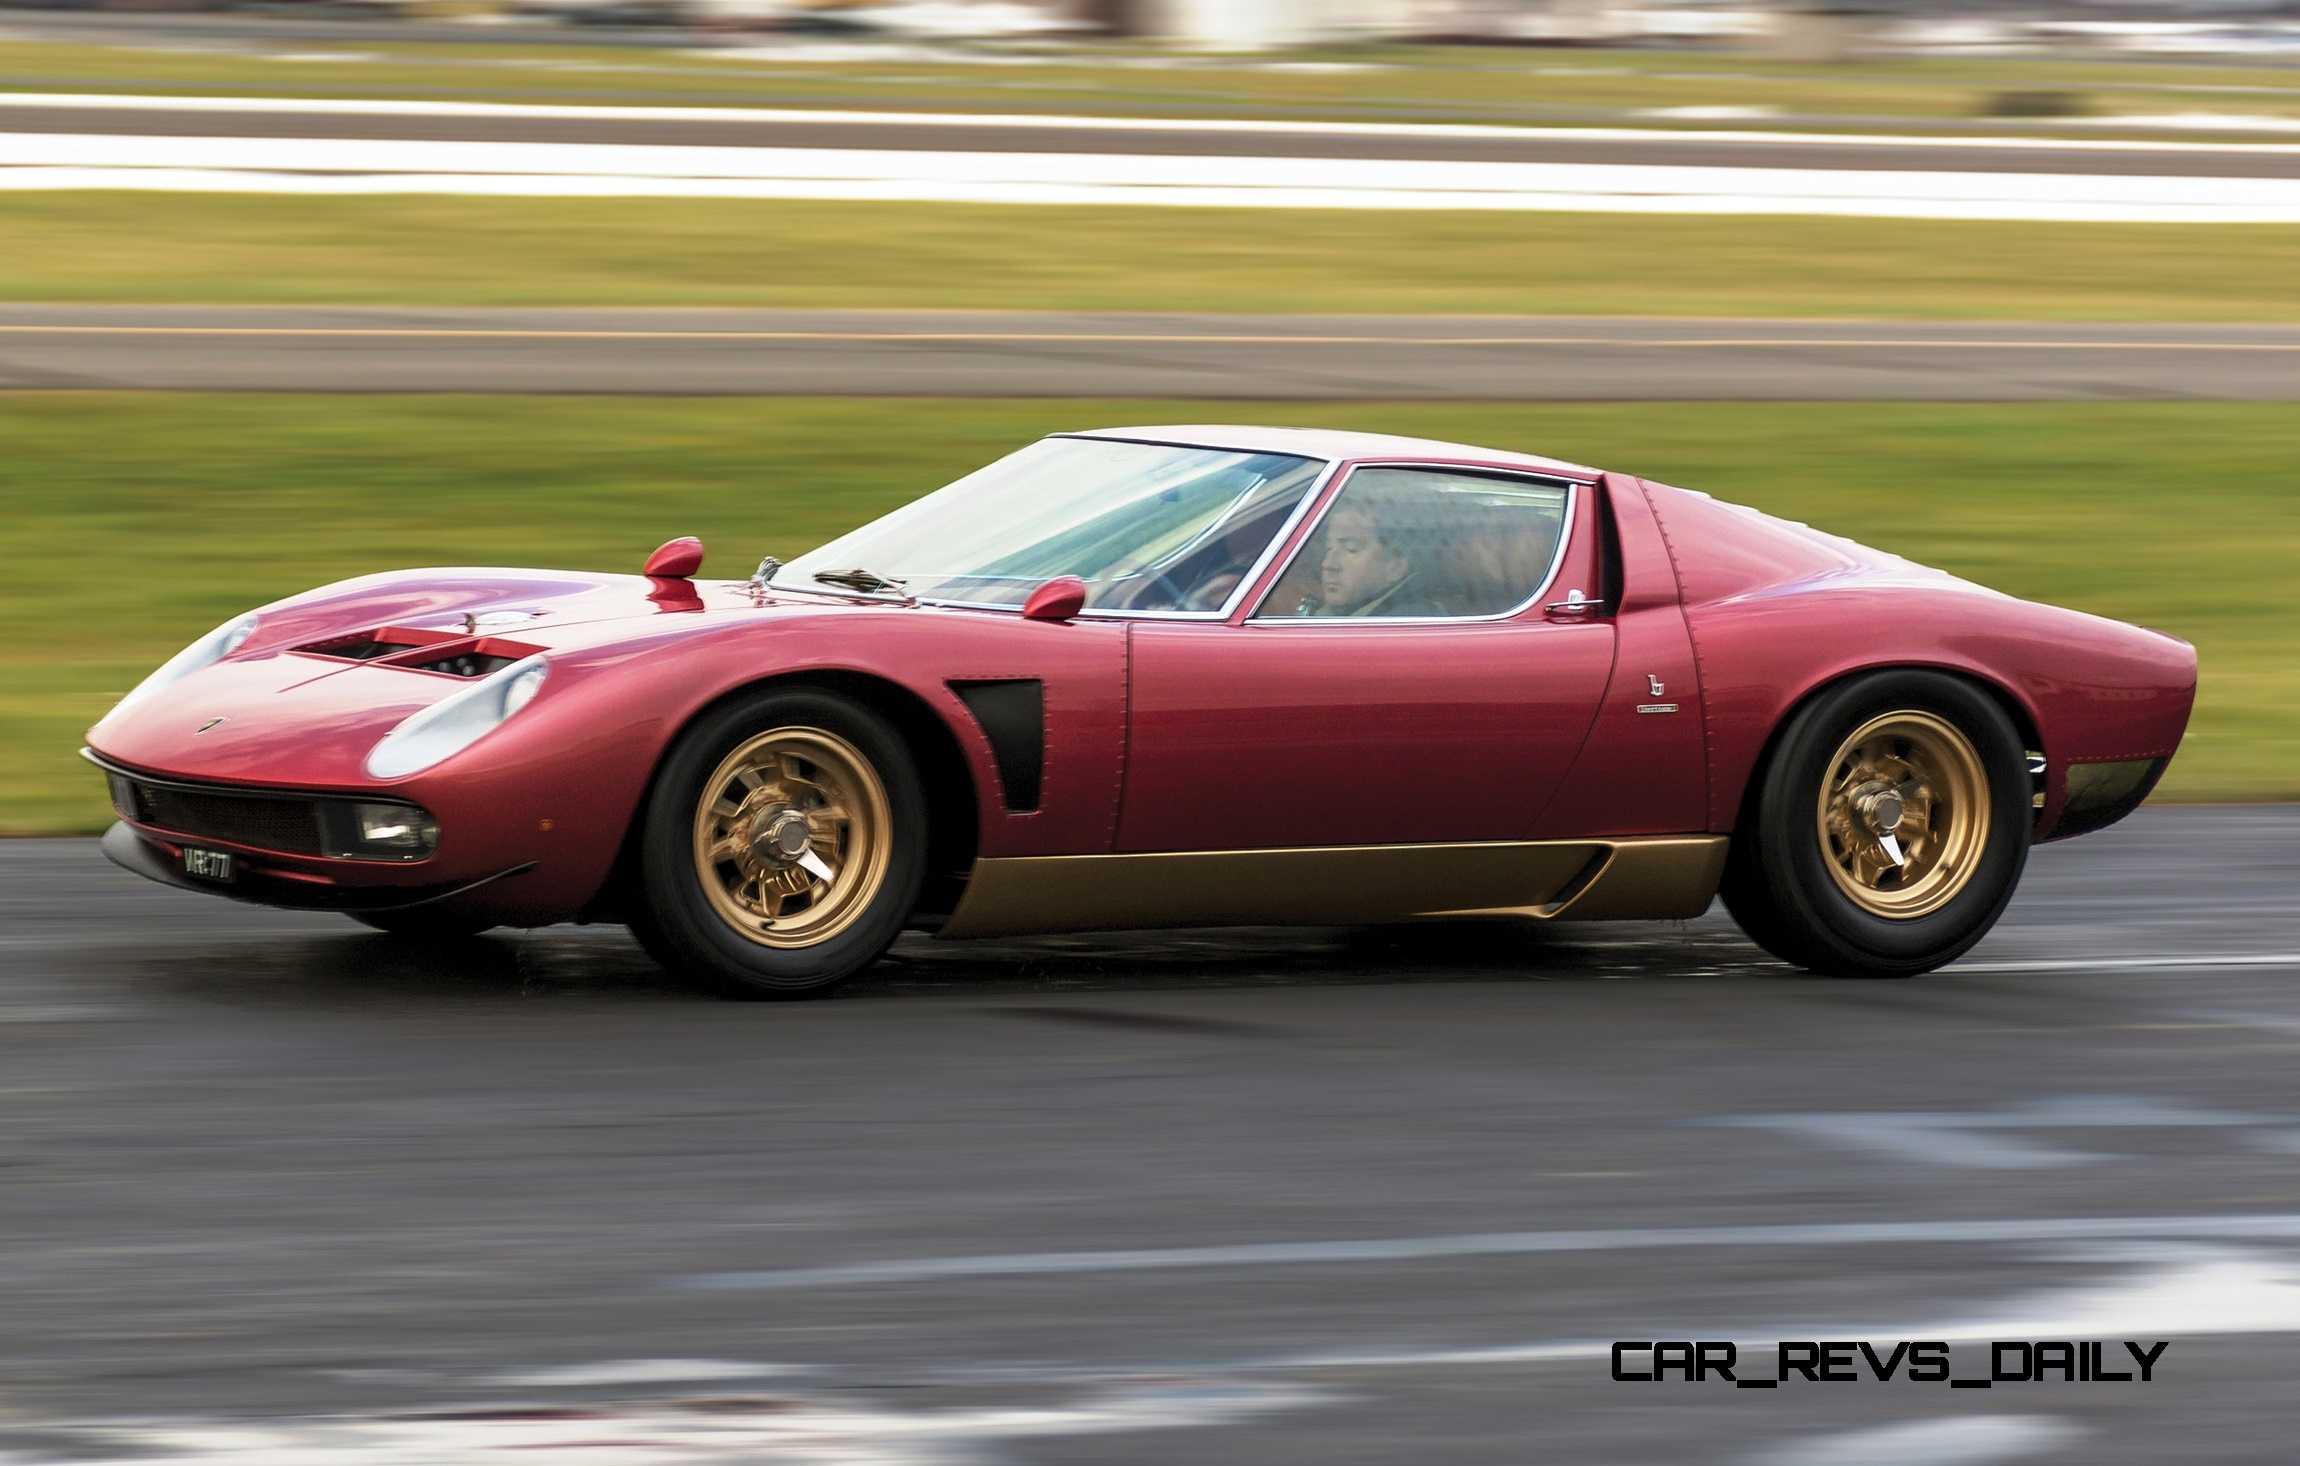 http://www.car-revs-daily.com/wp-content/uploads/2014/12/1971-Lamborghini-Miura-SV-Jota-29.jpg